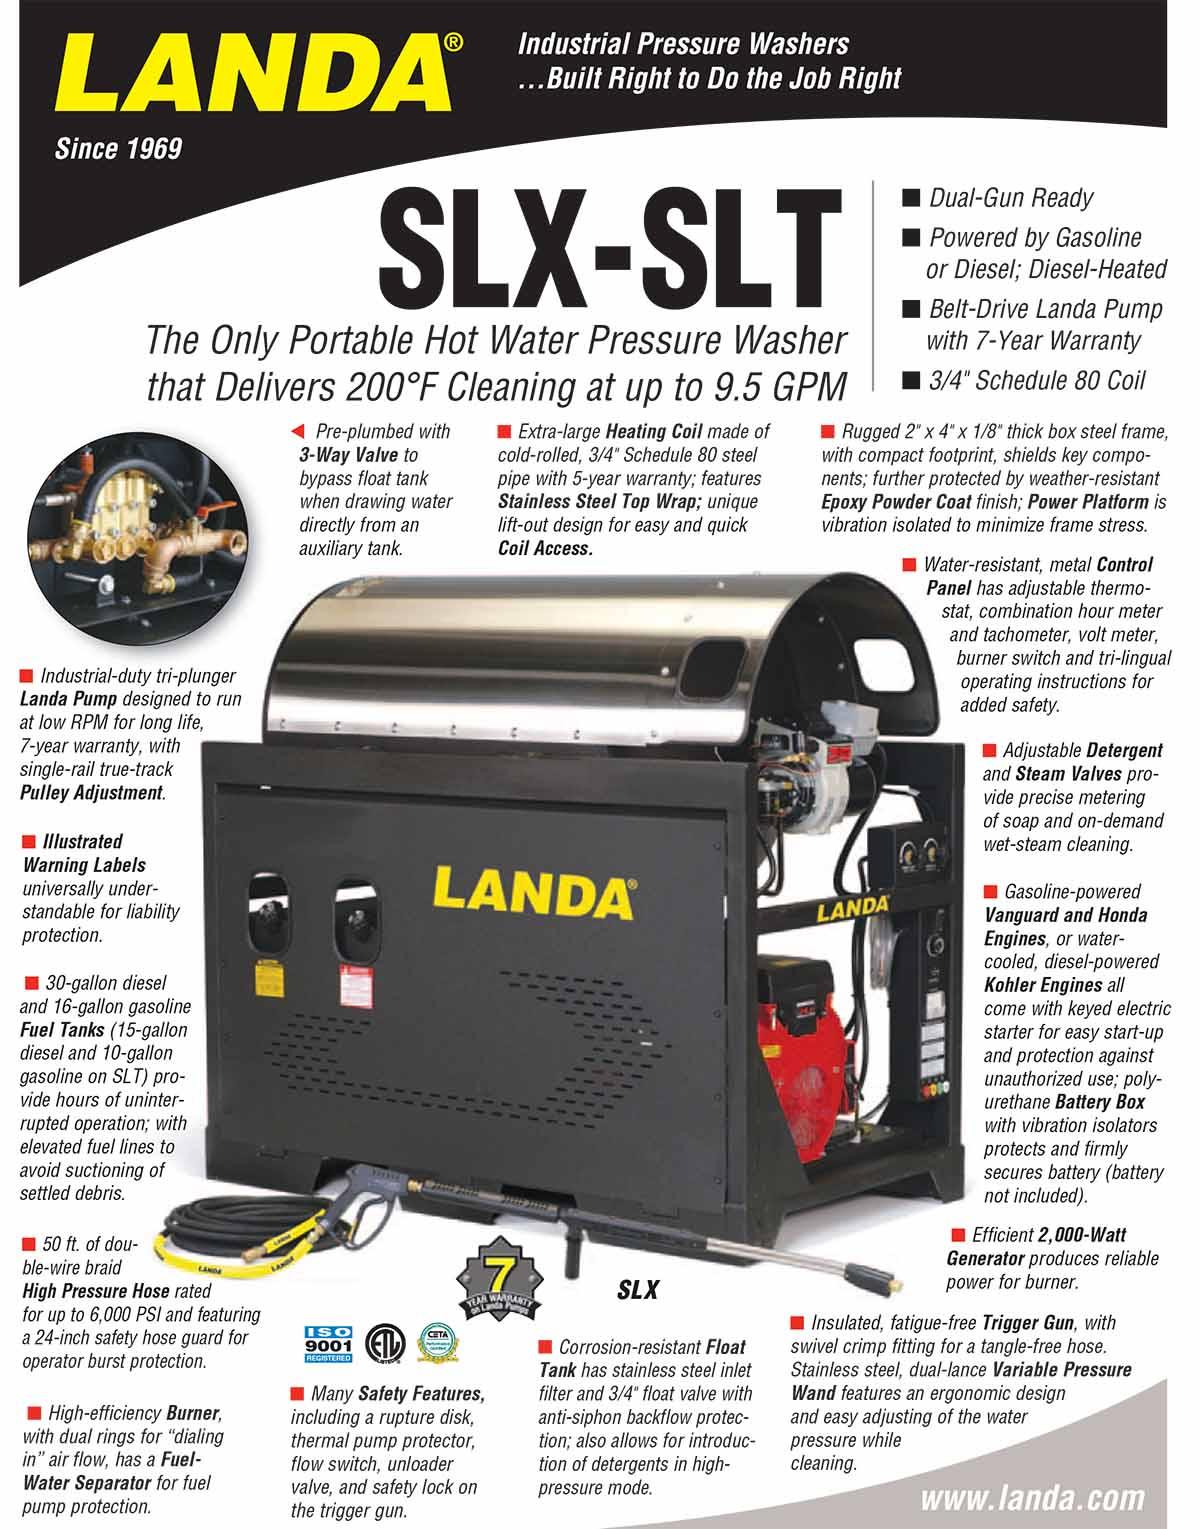 LANDA SLX-SLT Product Flyer